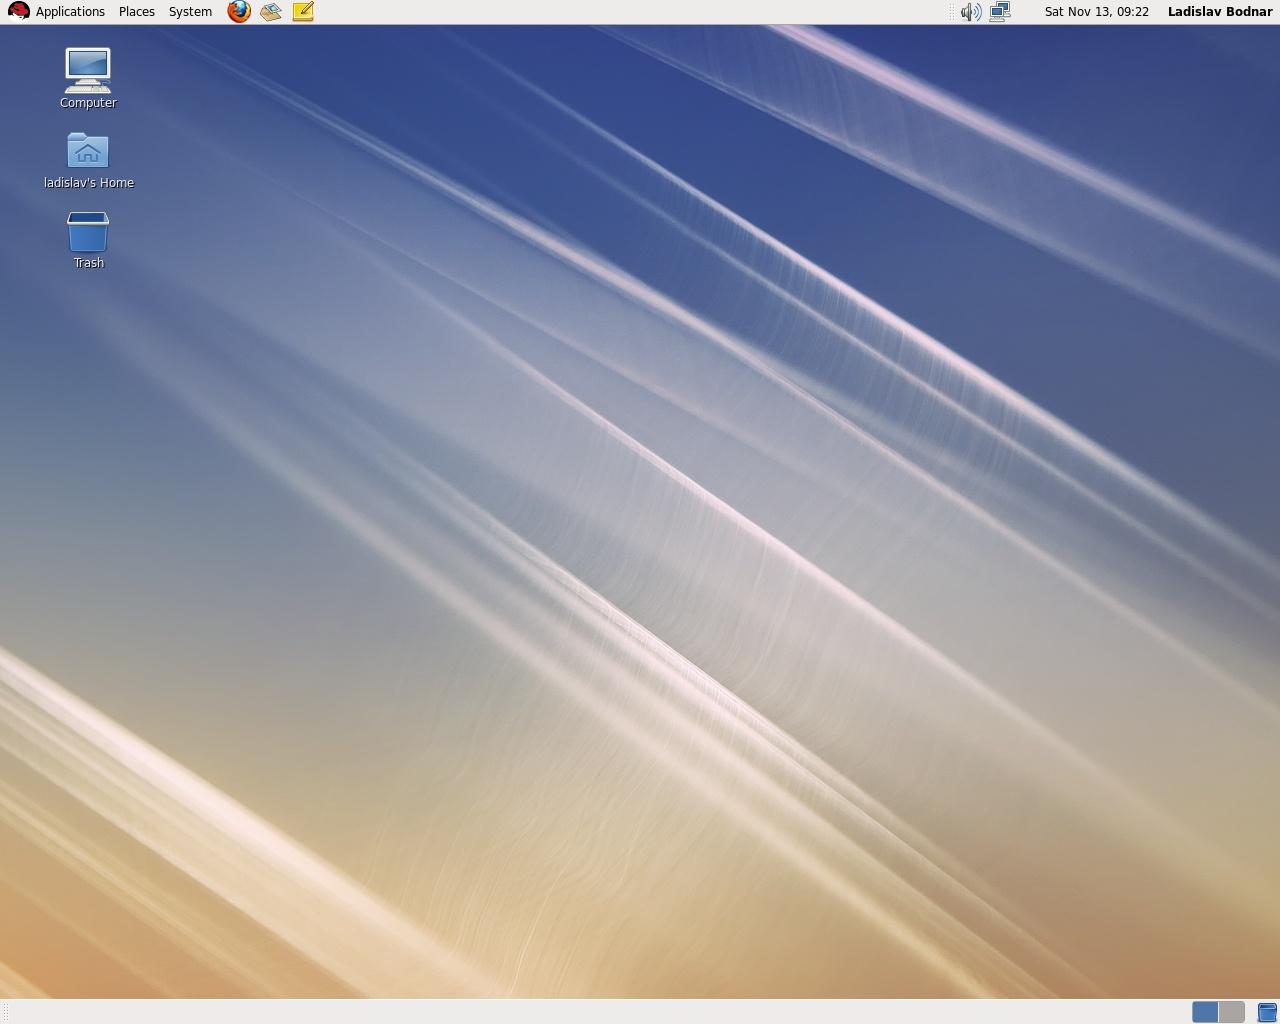 red hat enterprise linux 6.7 iso image free download